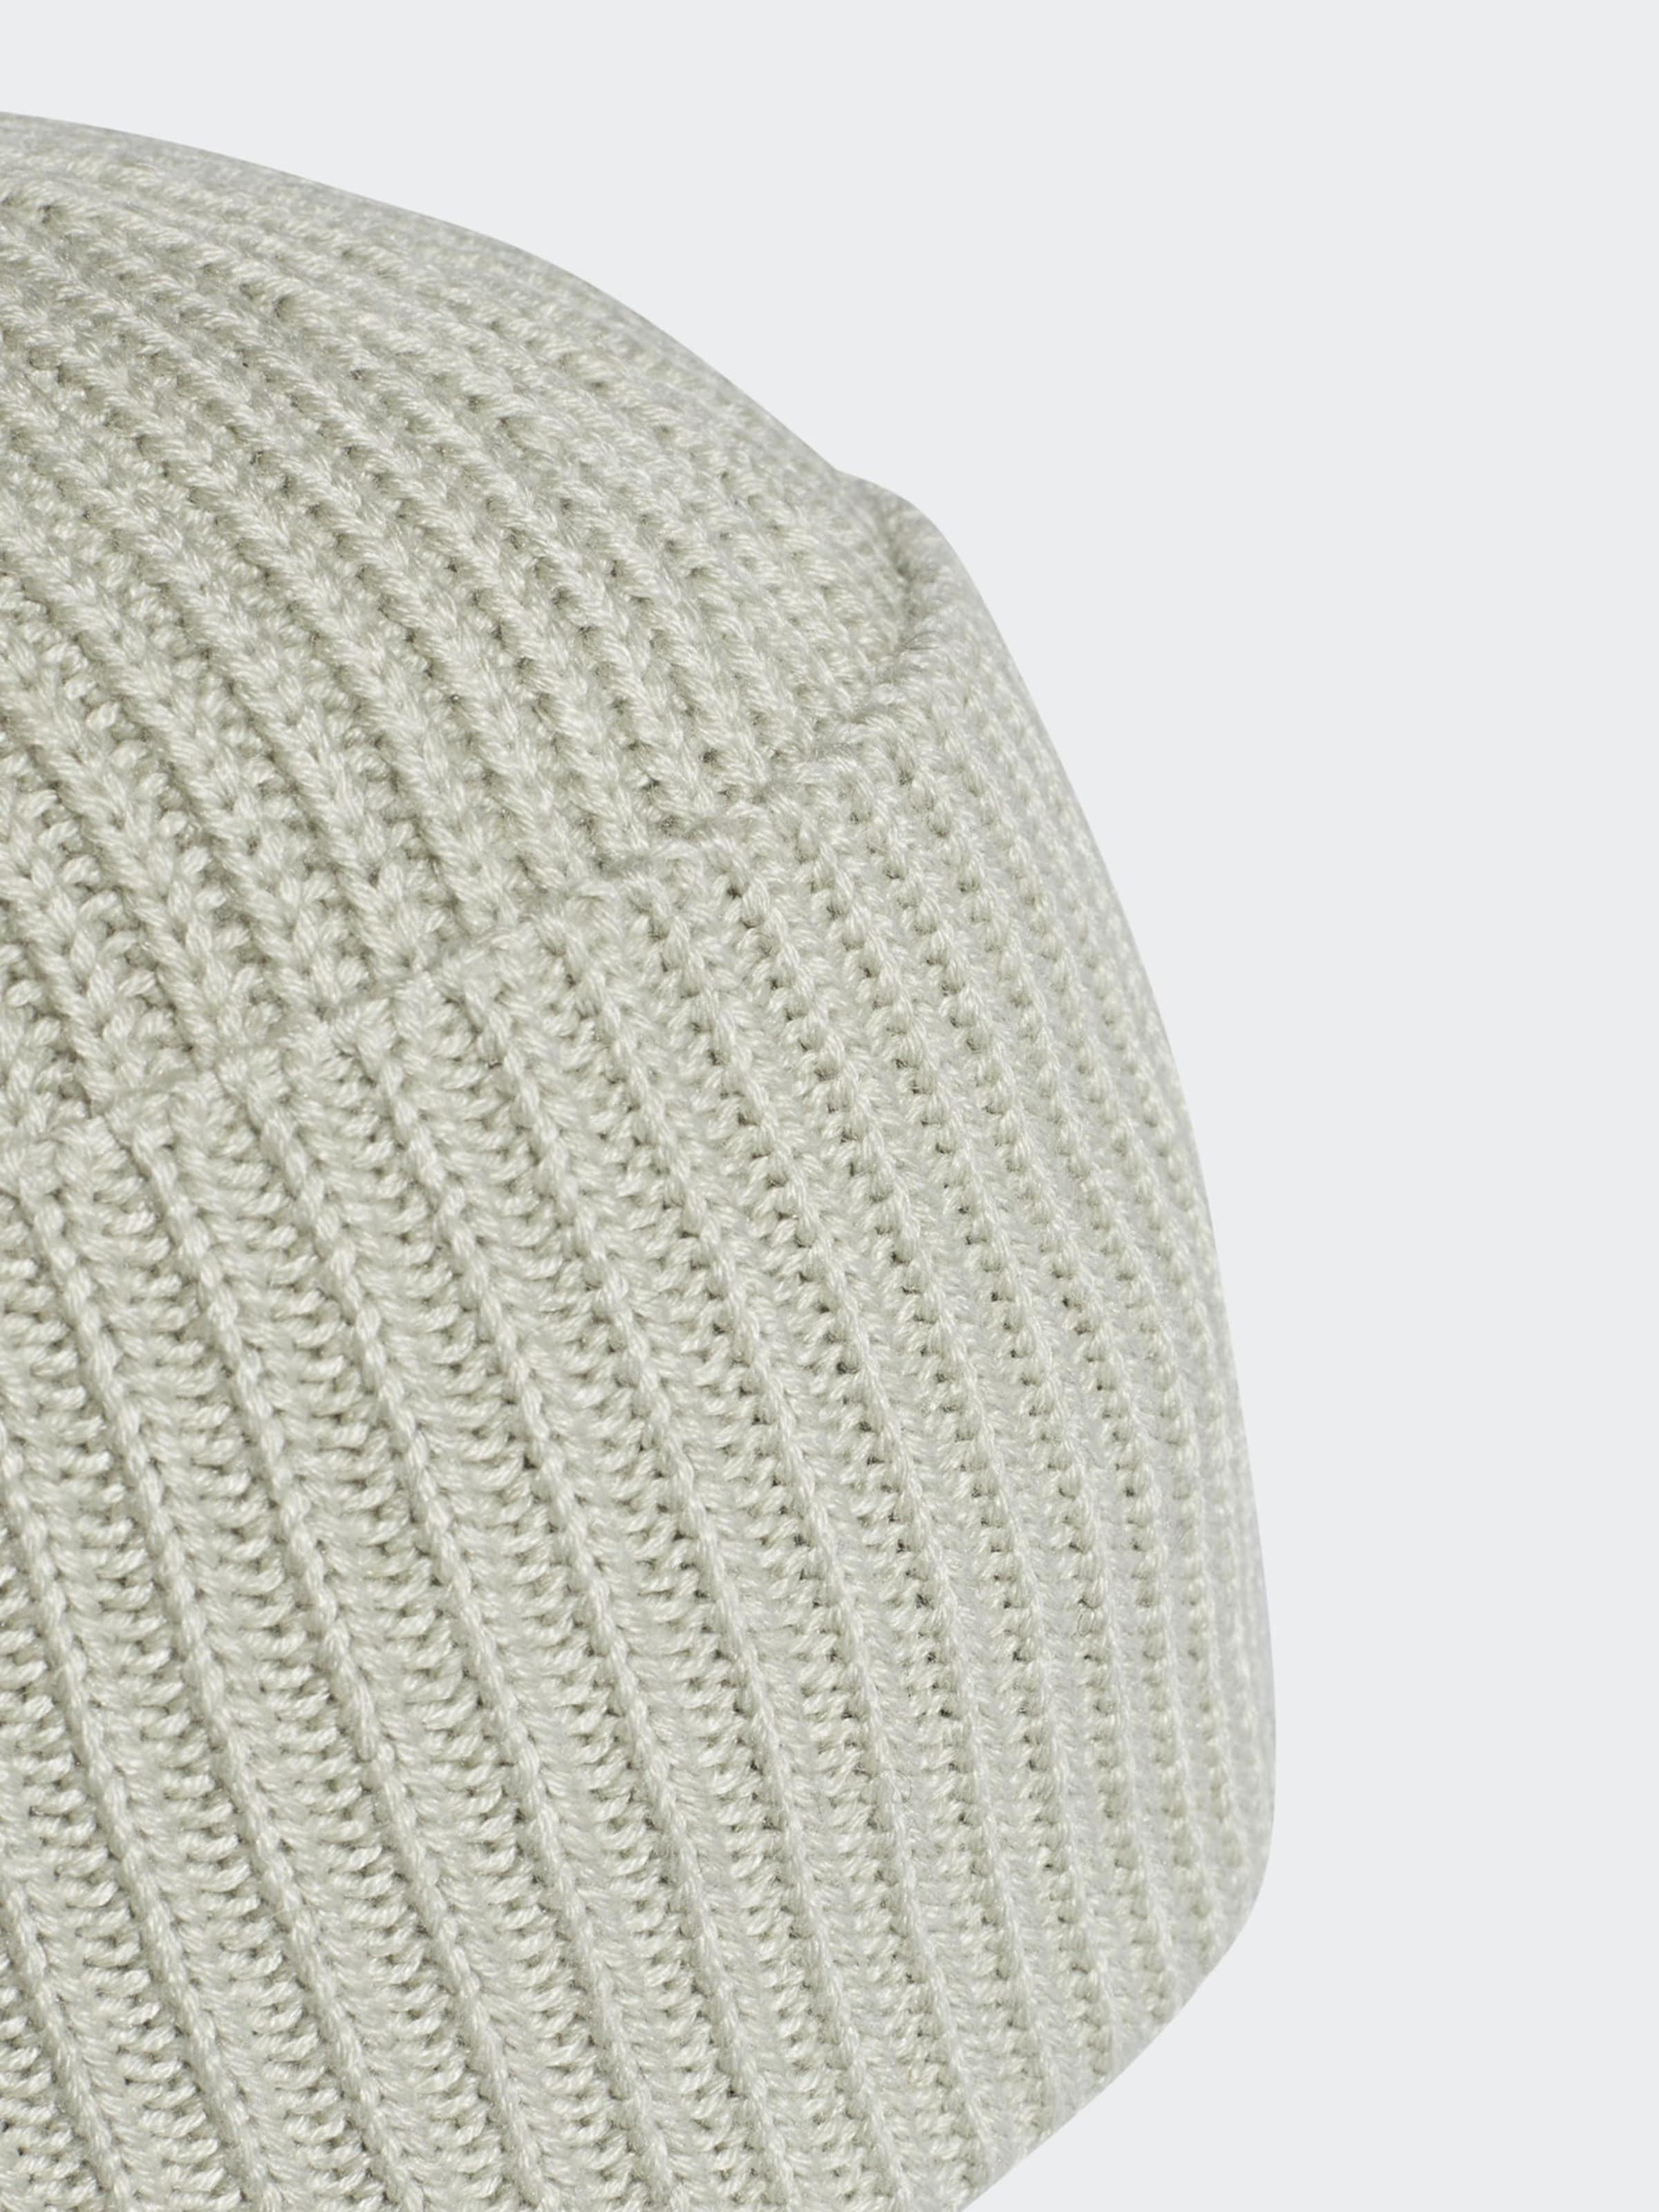 ePremium' In Mütze Beige Performance 'z Adidas n 1TFlc3KJ